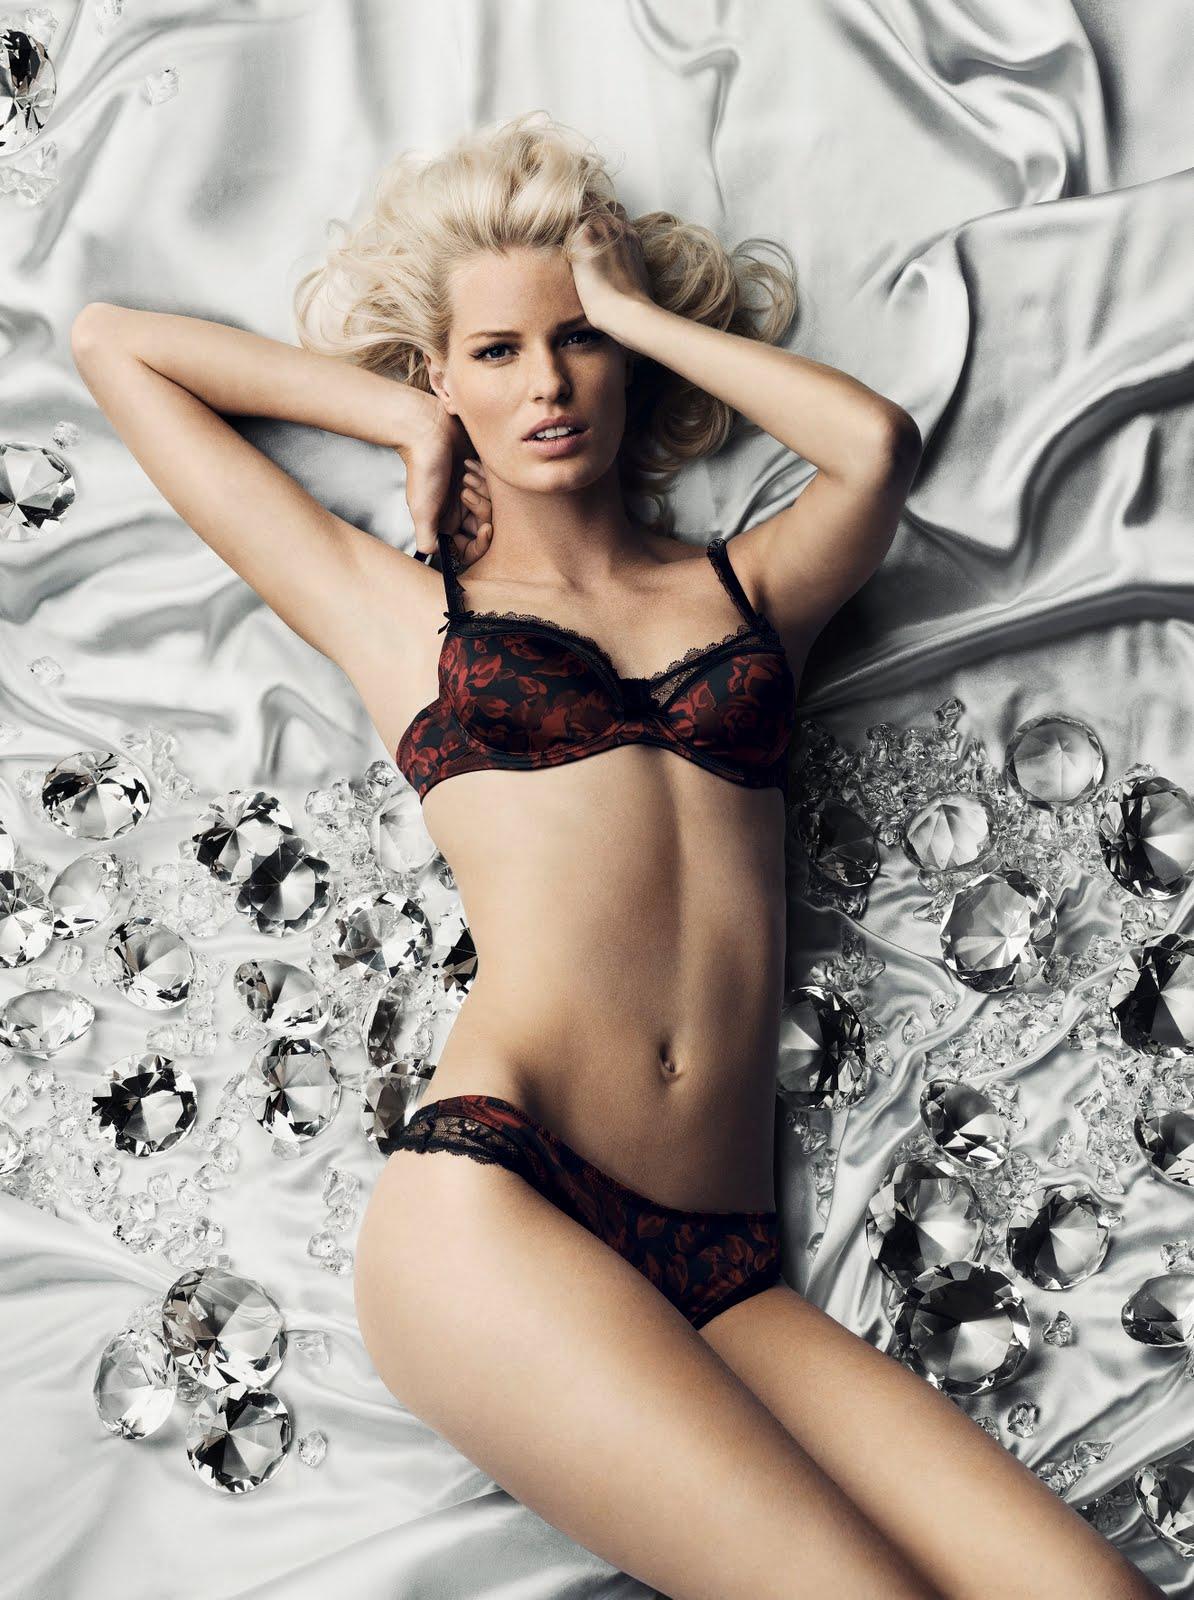 underwear Sex Caroline Winberg naked photo 2017